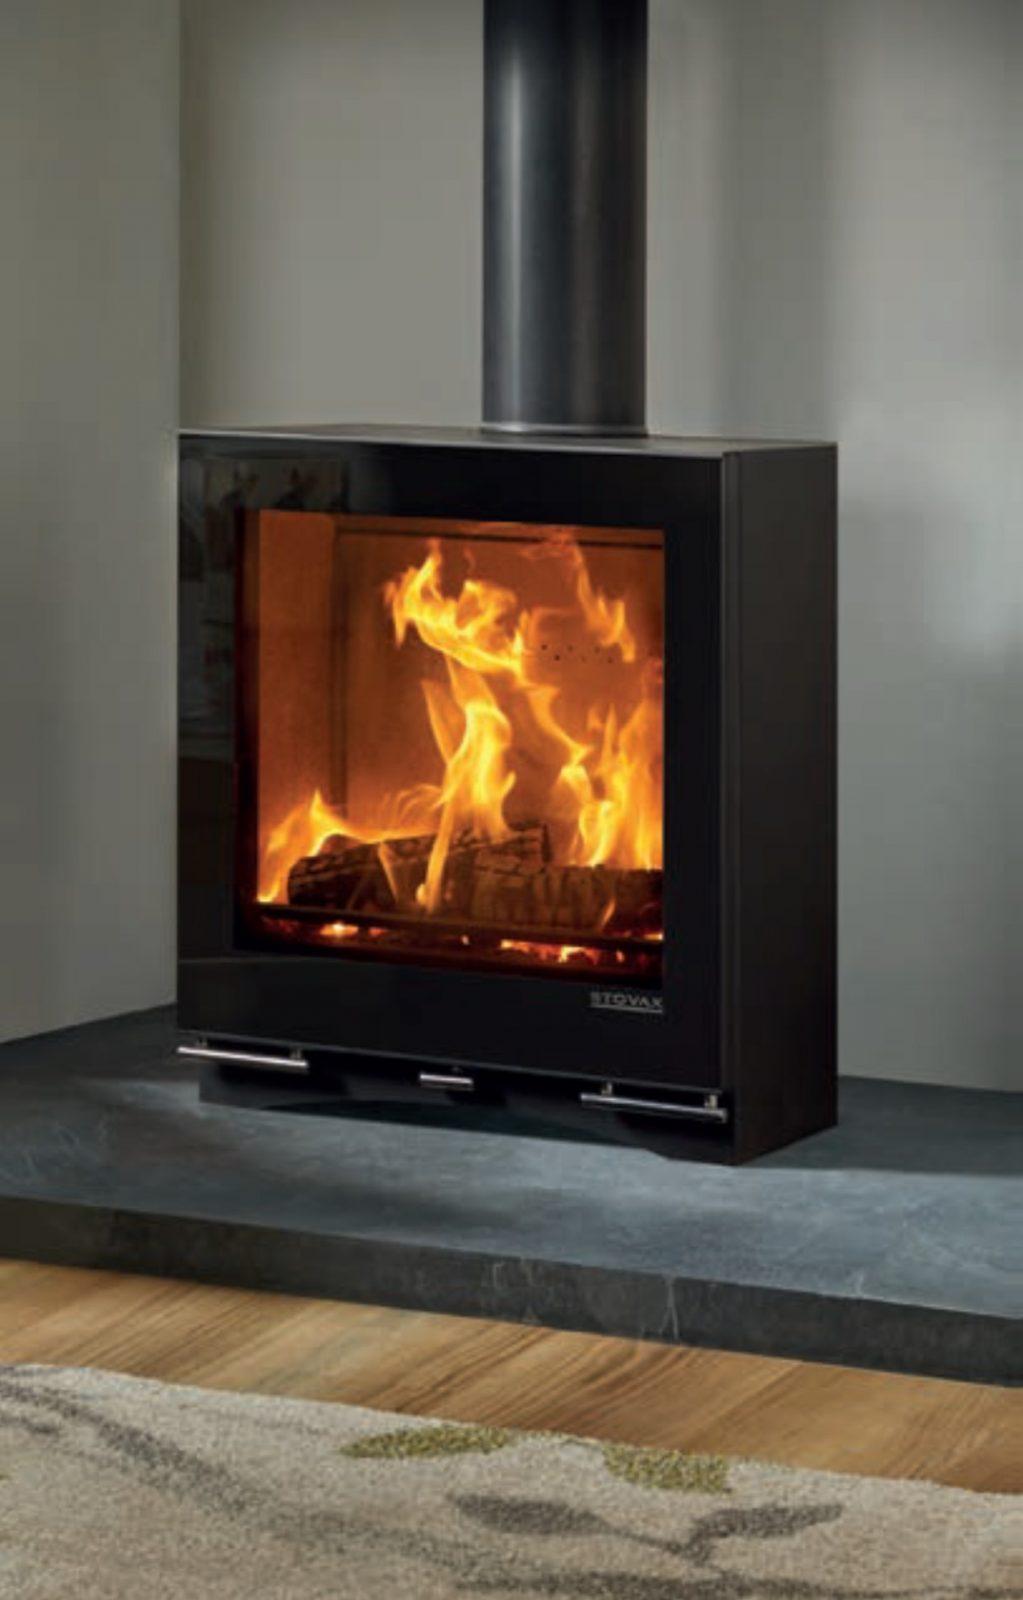 Stovax Riva Vision Medium Slimline Wood Burning Stove